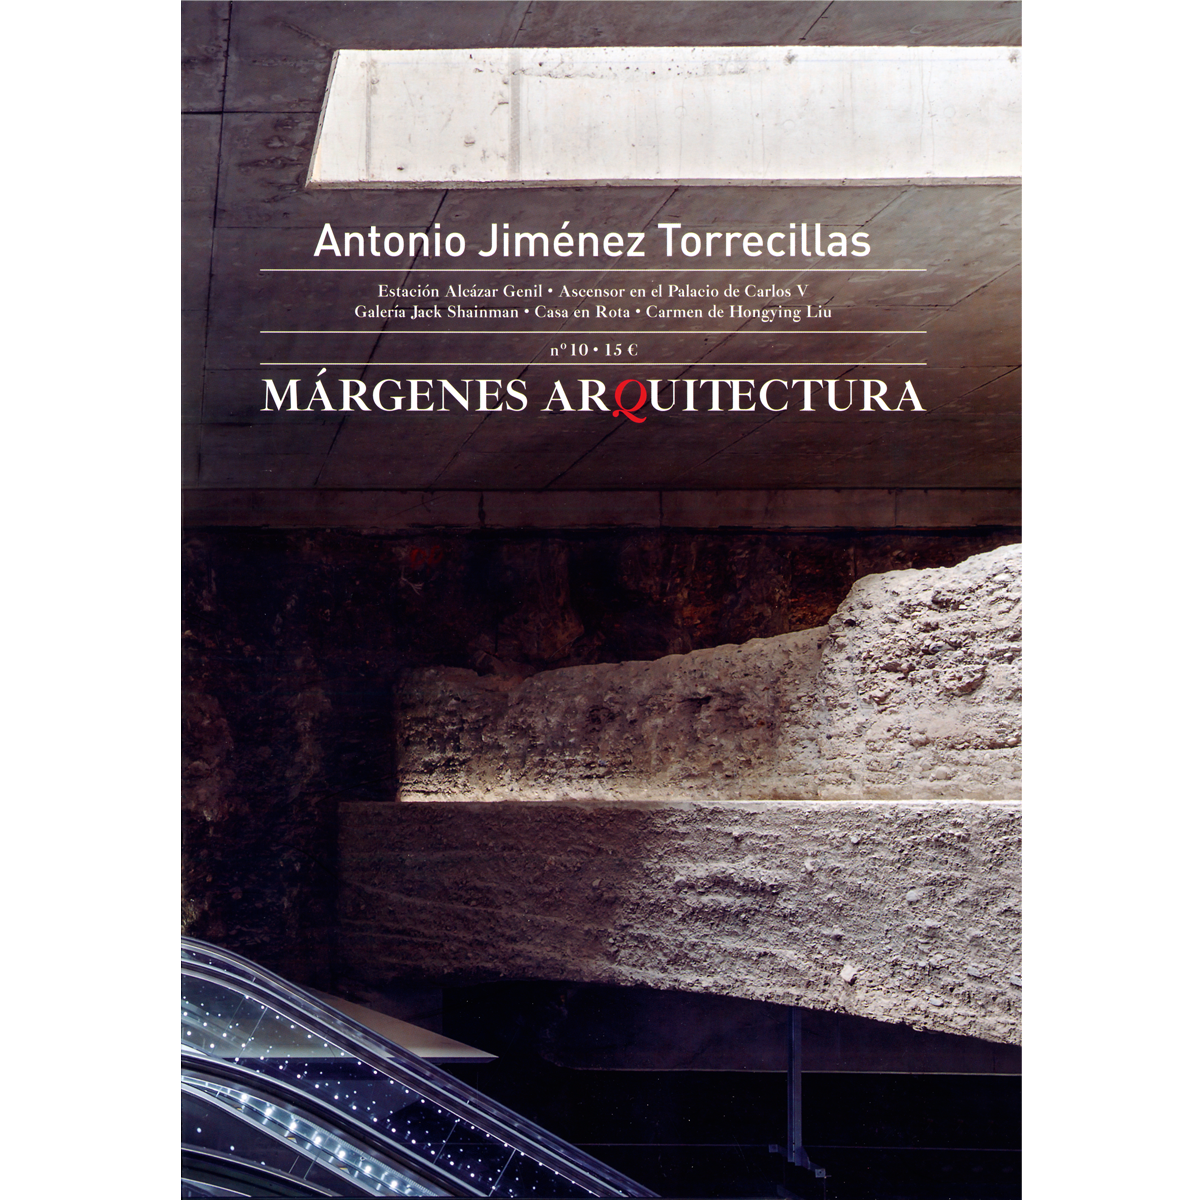 Antonio Jiménez Torrecillas